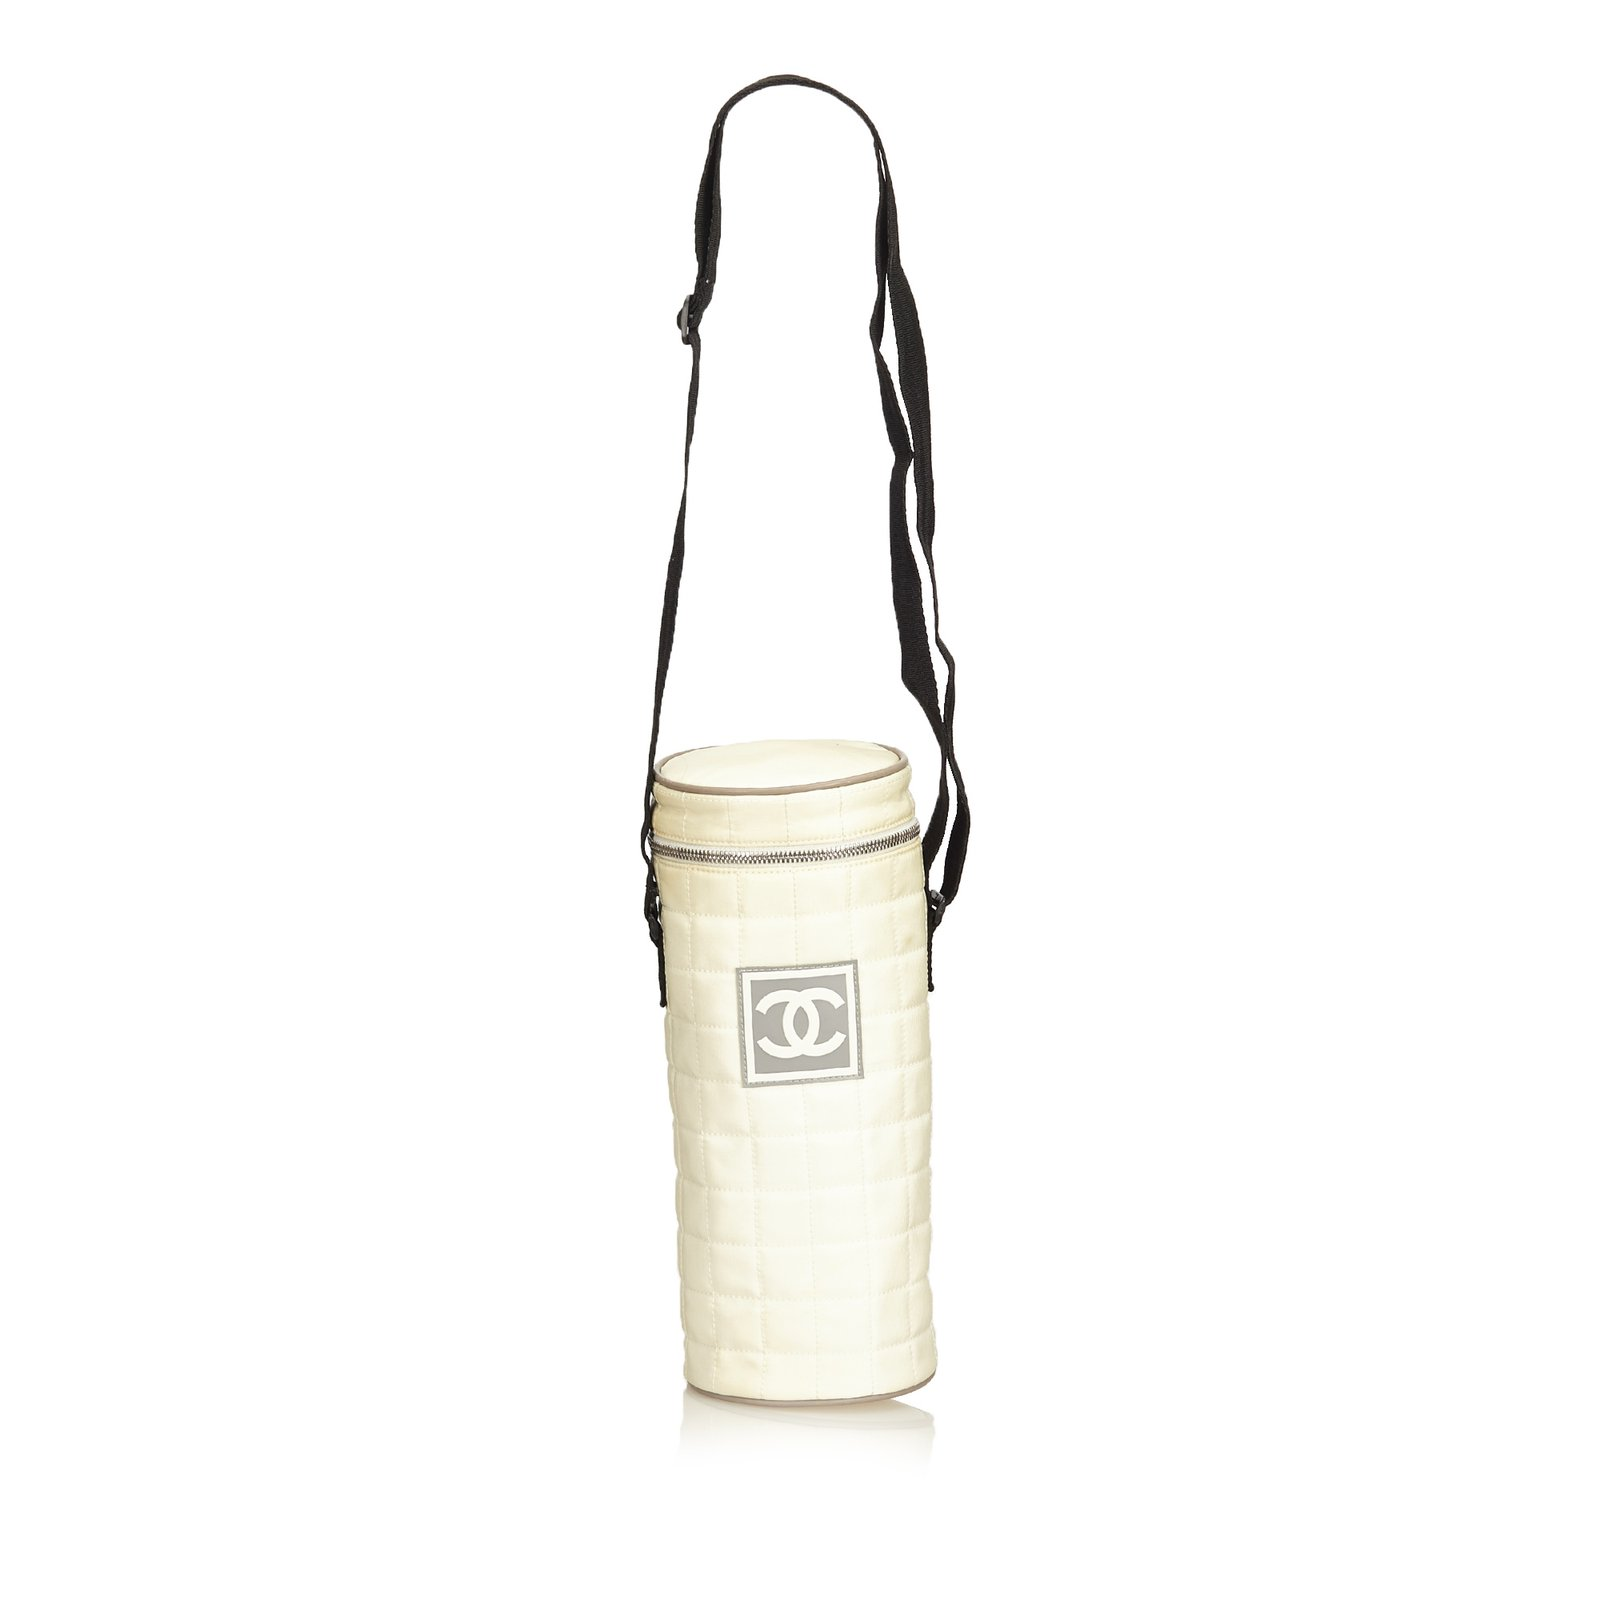 Chanel Sport Line Quilted Nylon Shoulder Bag Handbags Nylon fa6197a24709b